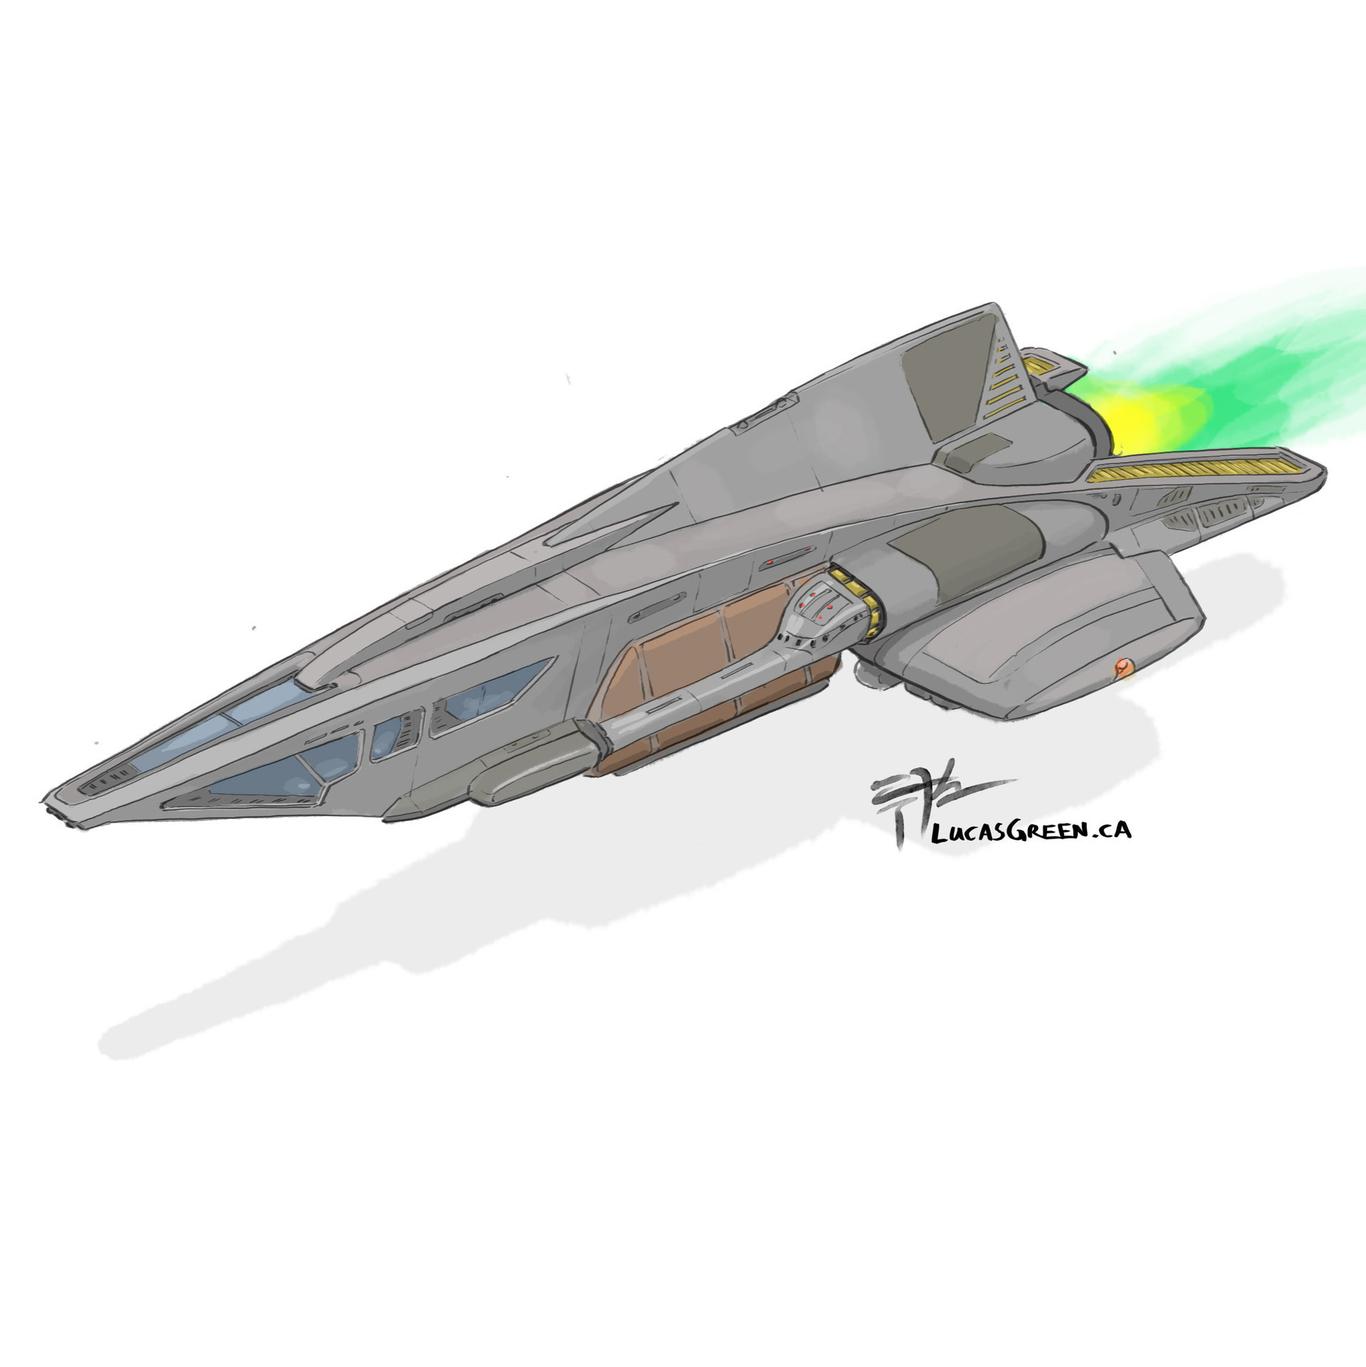 lucasgreen-daily-spaceship-sket-1-56f4f4